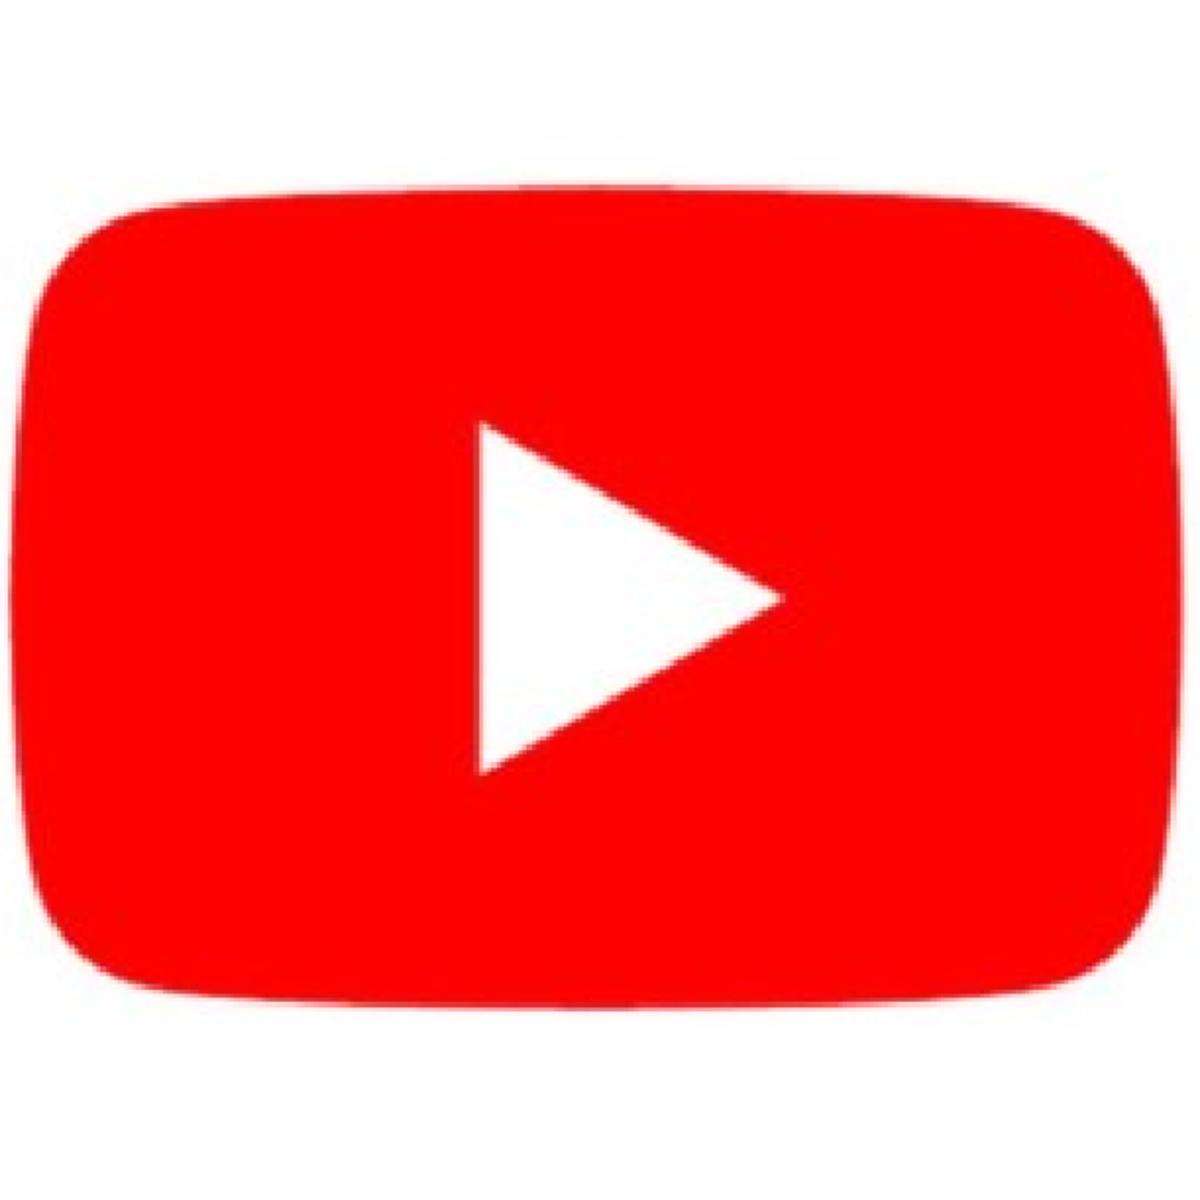 Trending YouTube Video Statistics   Kaggle